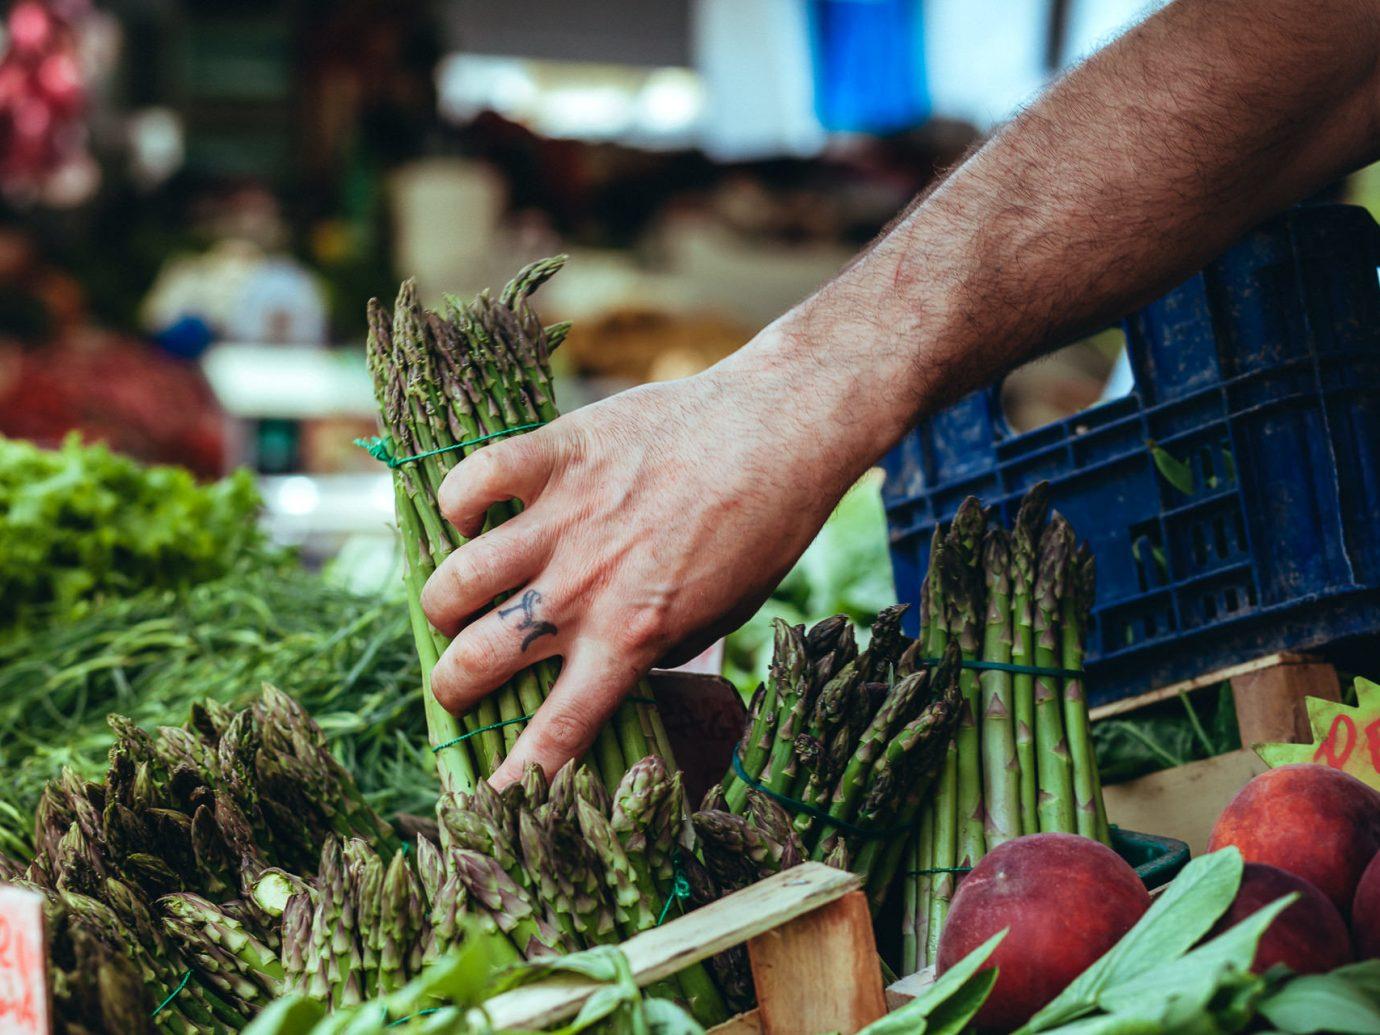 Food + Drink person local food City public space vegetable market human settlement food floristry produce vendor sense plant fresh asparagus